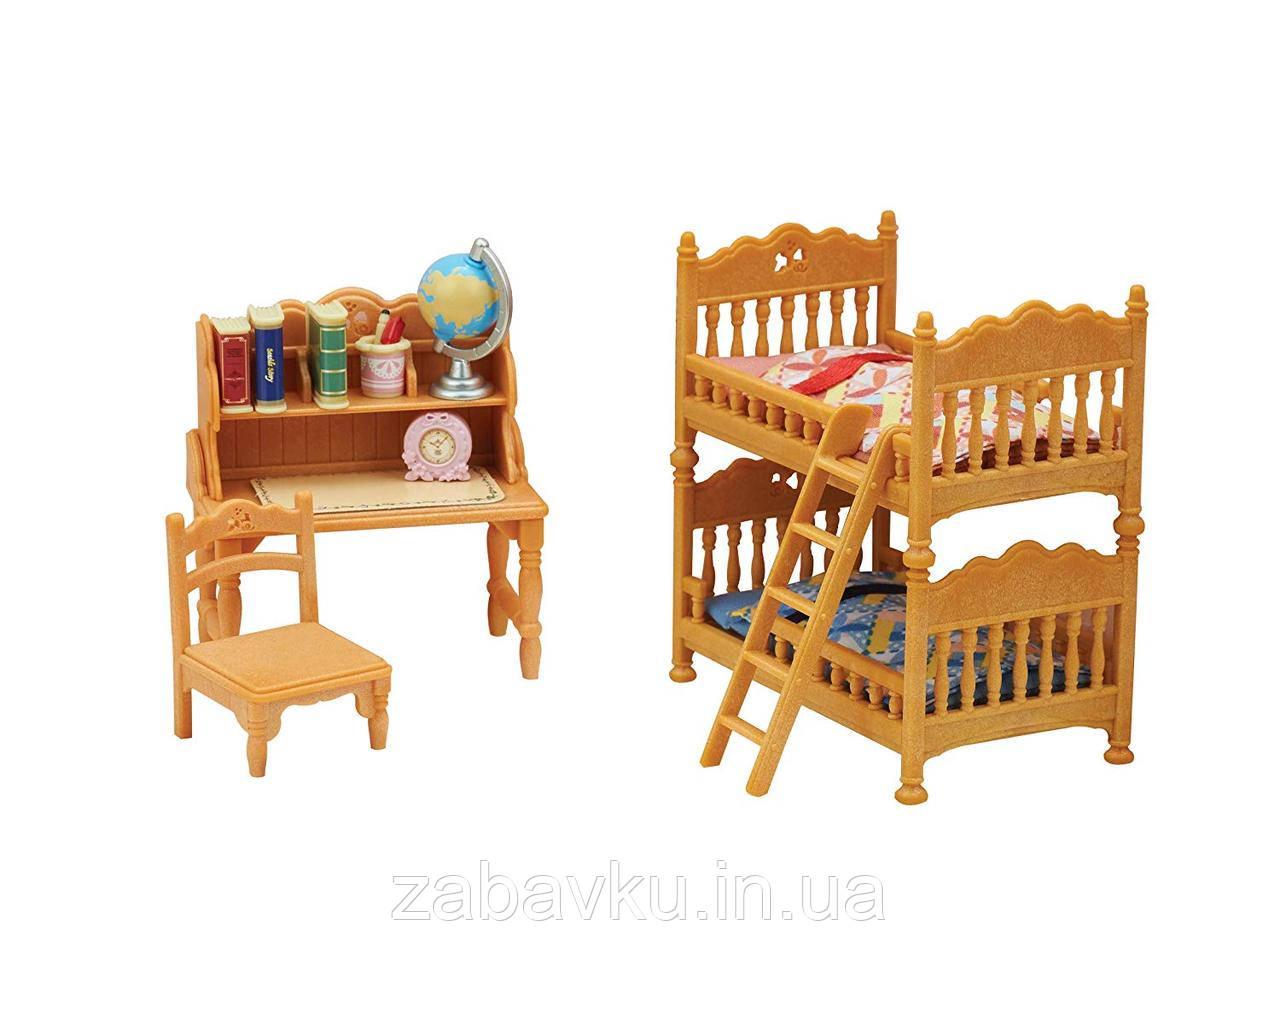 Сільваніан дитяча спальня Calico Critters Children´s Bedroom Set